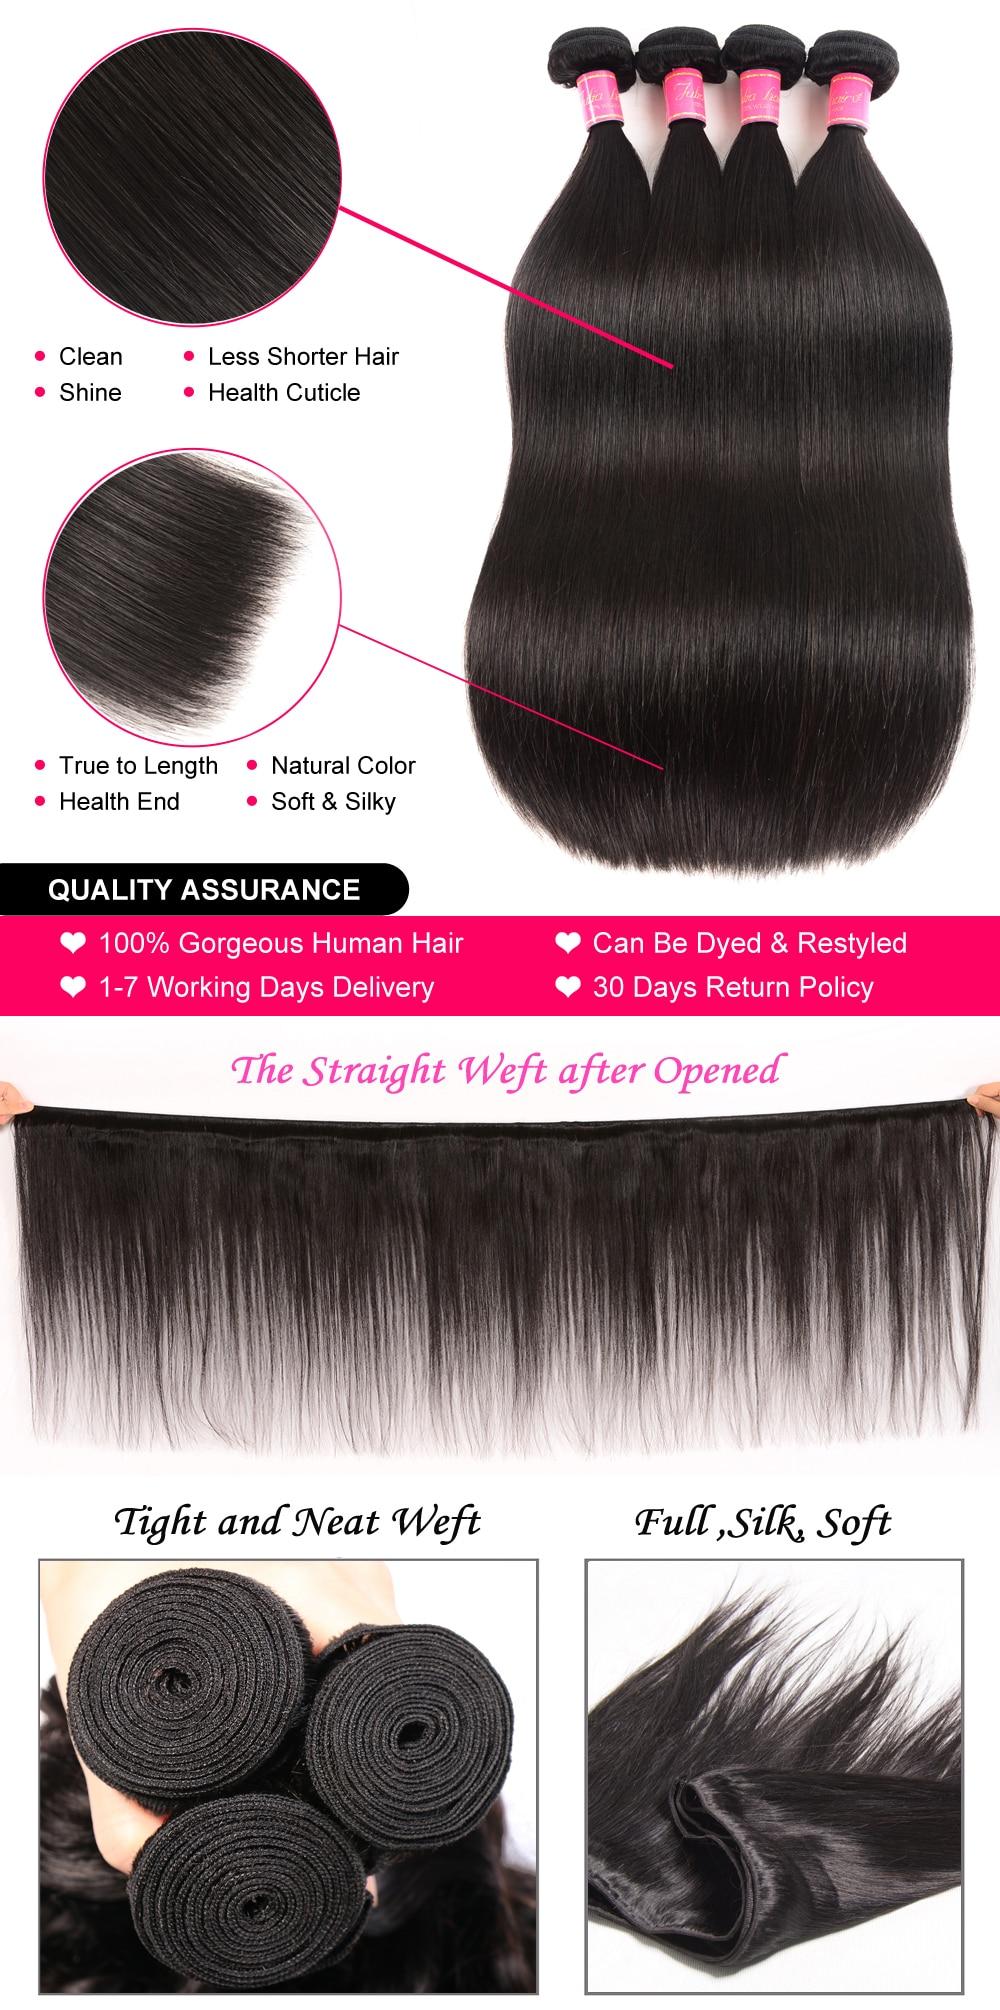 Ali Julia Hair Brazilian Straight Human Hair Bundles Remy 8 Inches to 30 Inches 1PC 3PCS 4PCS 100% Human Hair Weave Extensions (4)